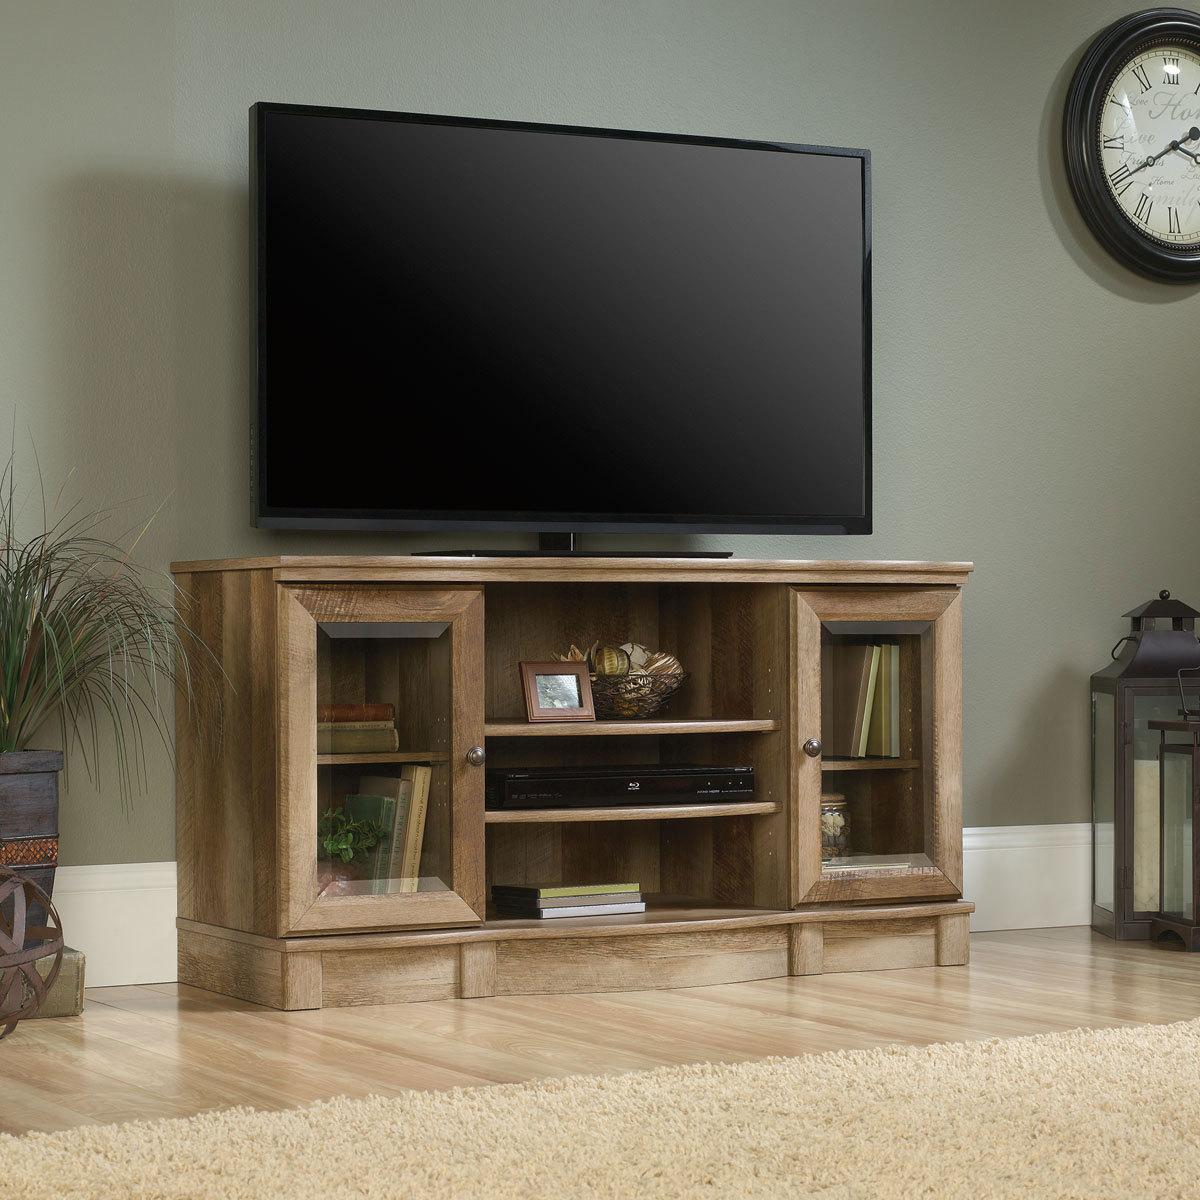 sauder regent place tv stand - Sauder Tv Stands